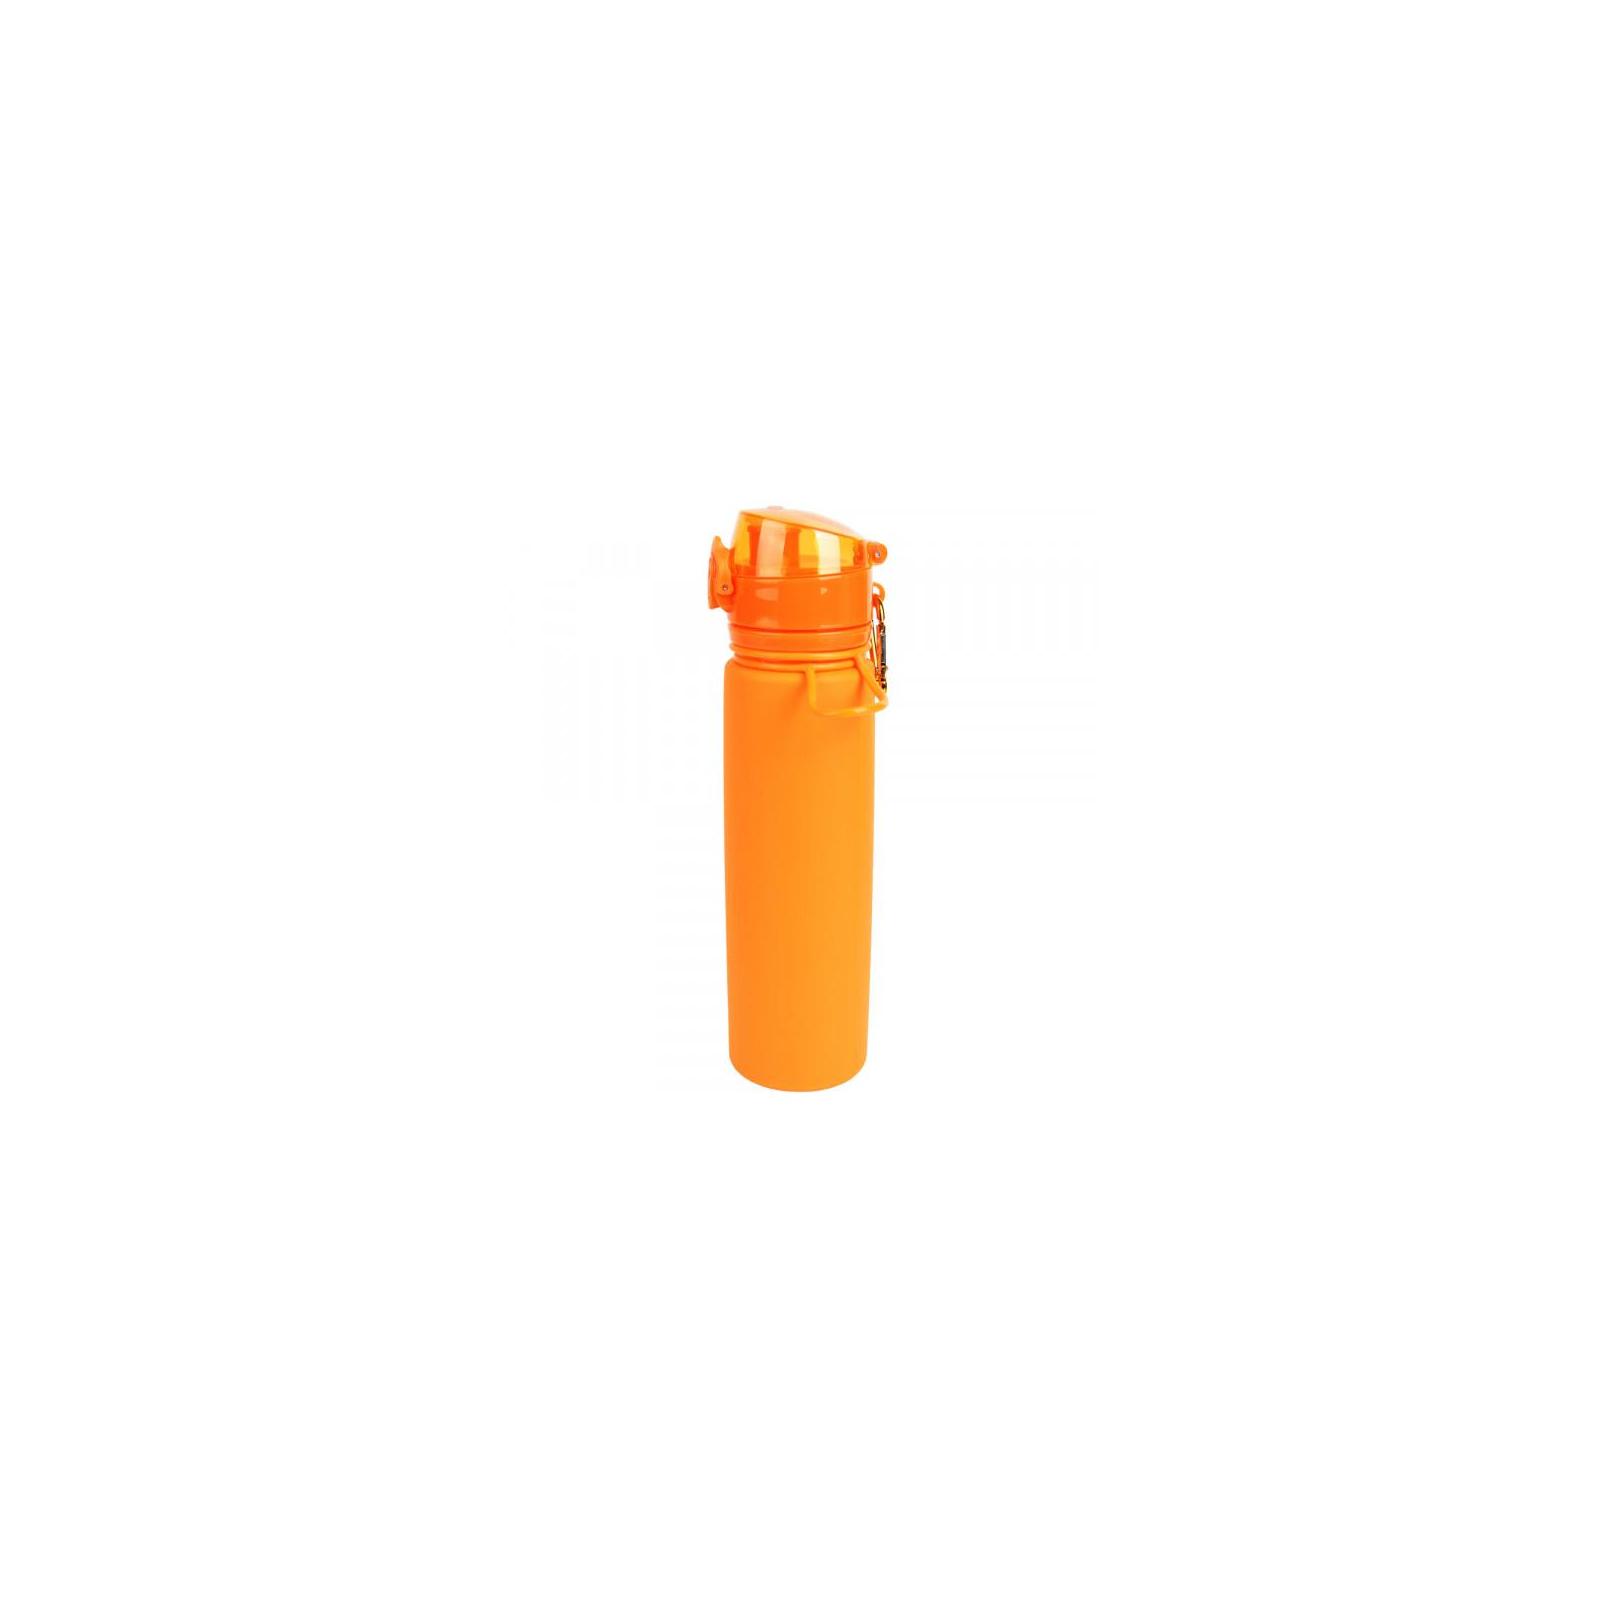 Бутылка для воды Tramp TRC-094 orange (TRC-094-orange)